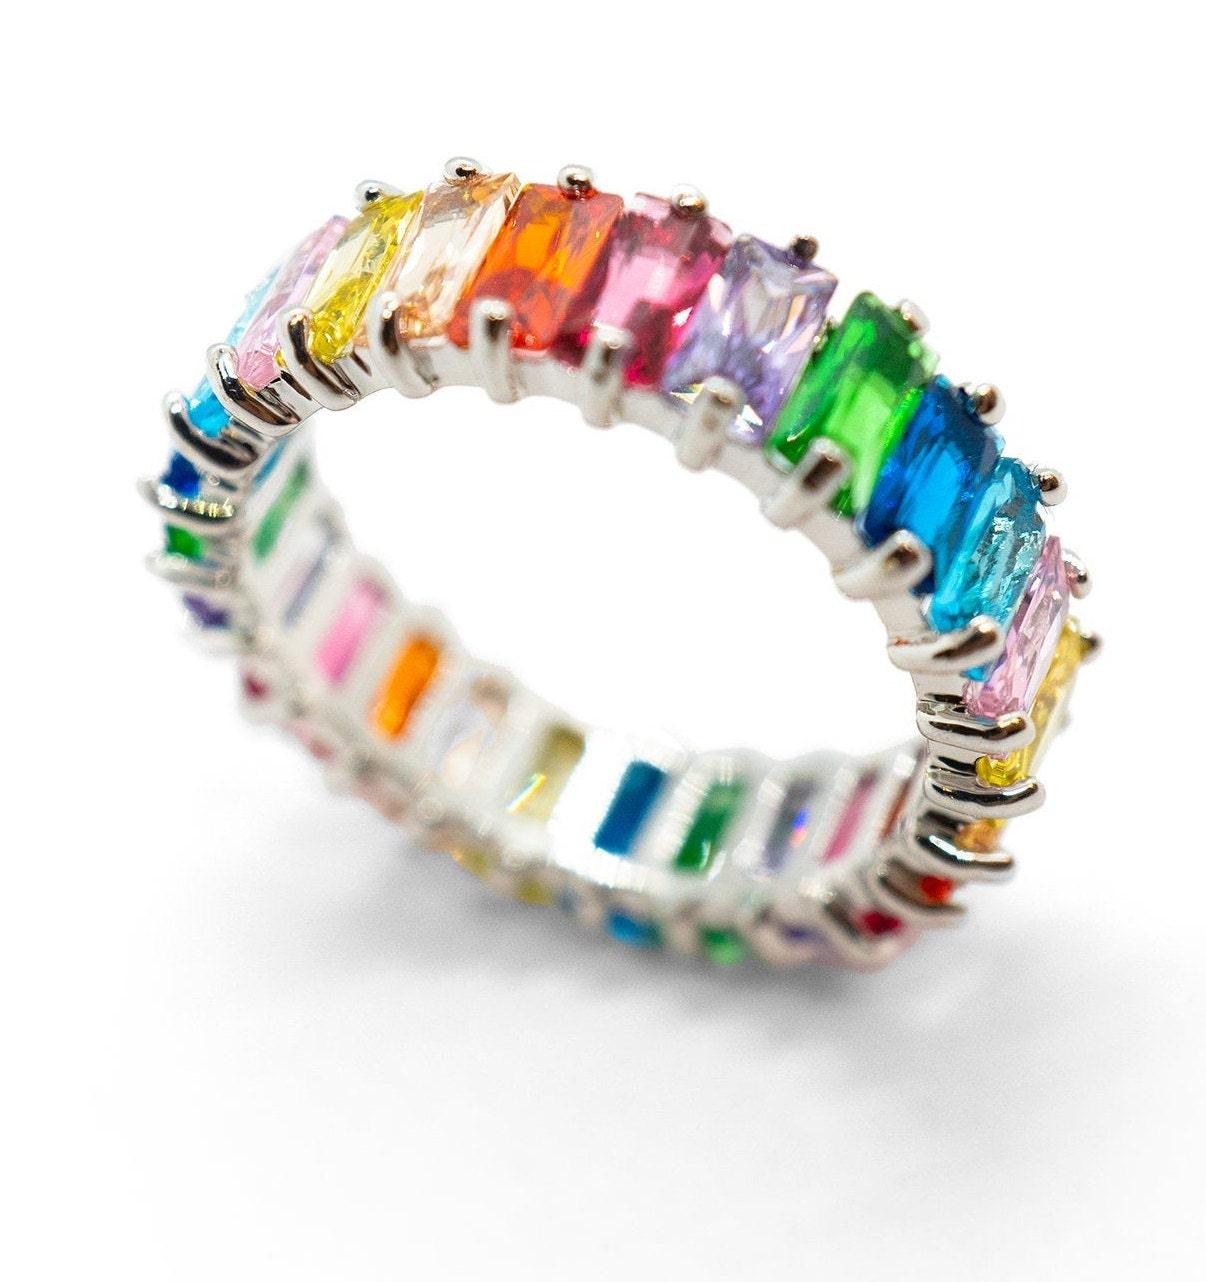 18K Multicolor Rainbow Eternity Ring, Ombre Eternity Band, Full Eternity Band, Ombre Rainbow Ring, Multicolor Ring, Rainbow Eternity Band for sale